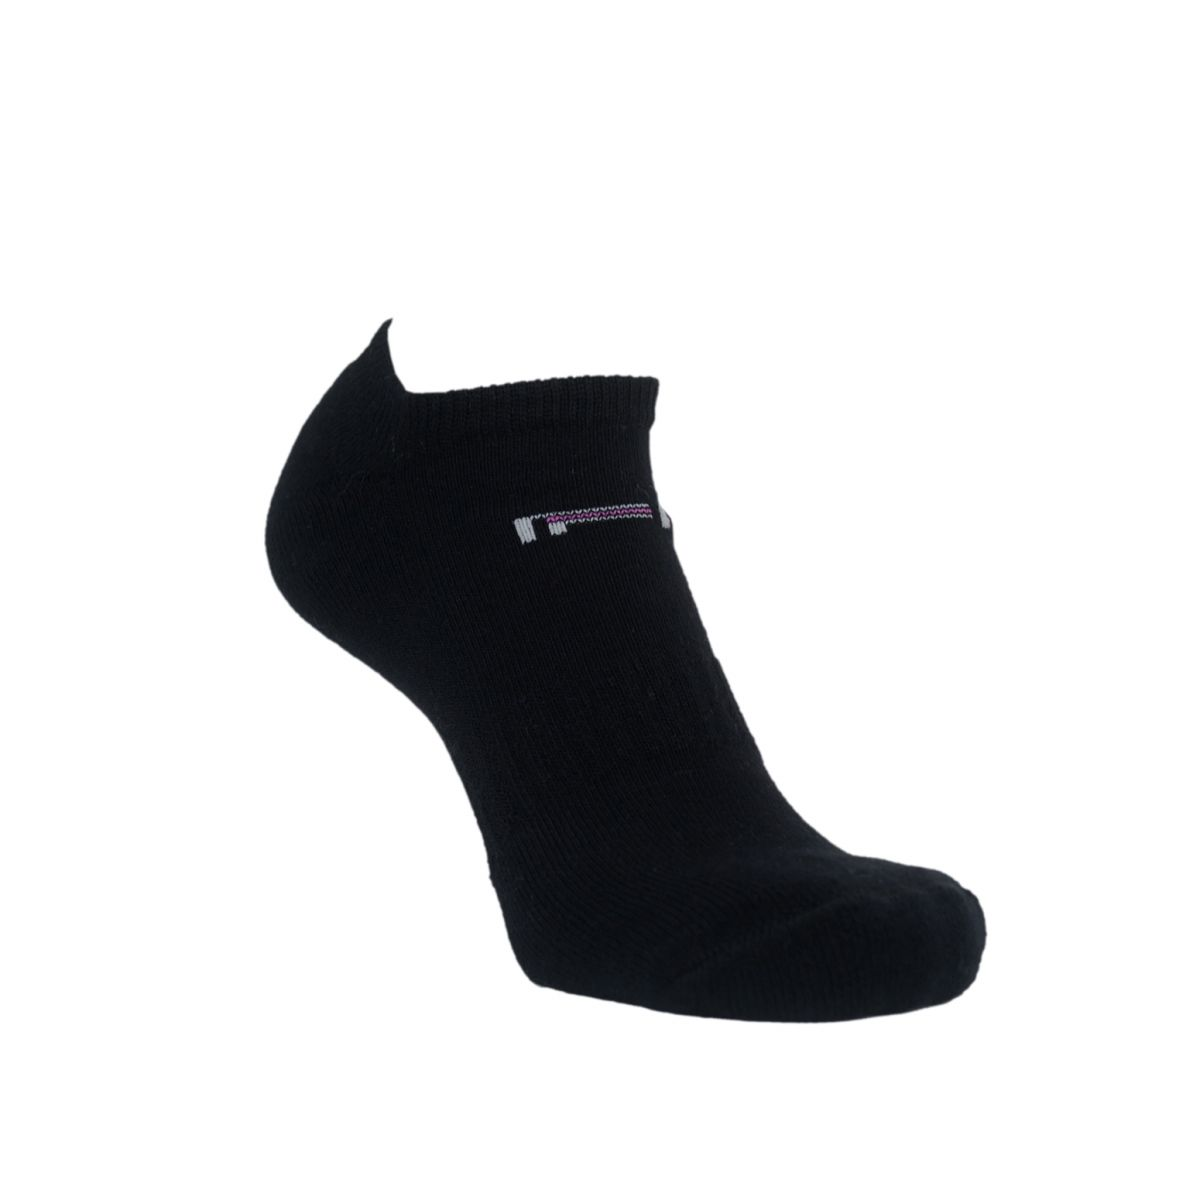 Par de meia sapatilha técnica feminina